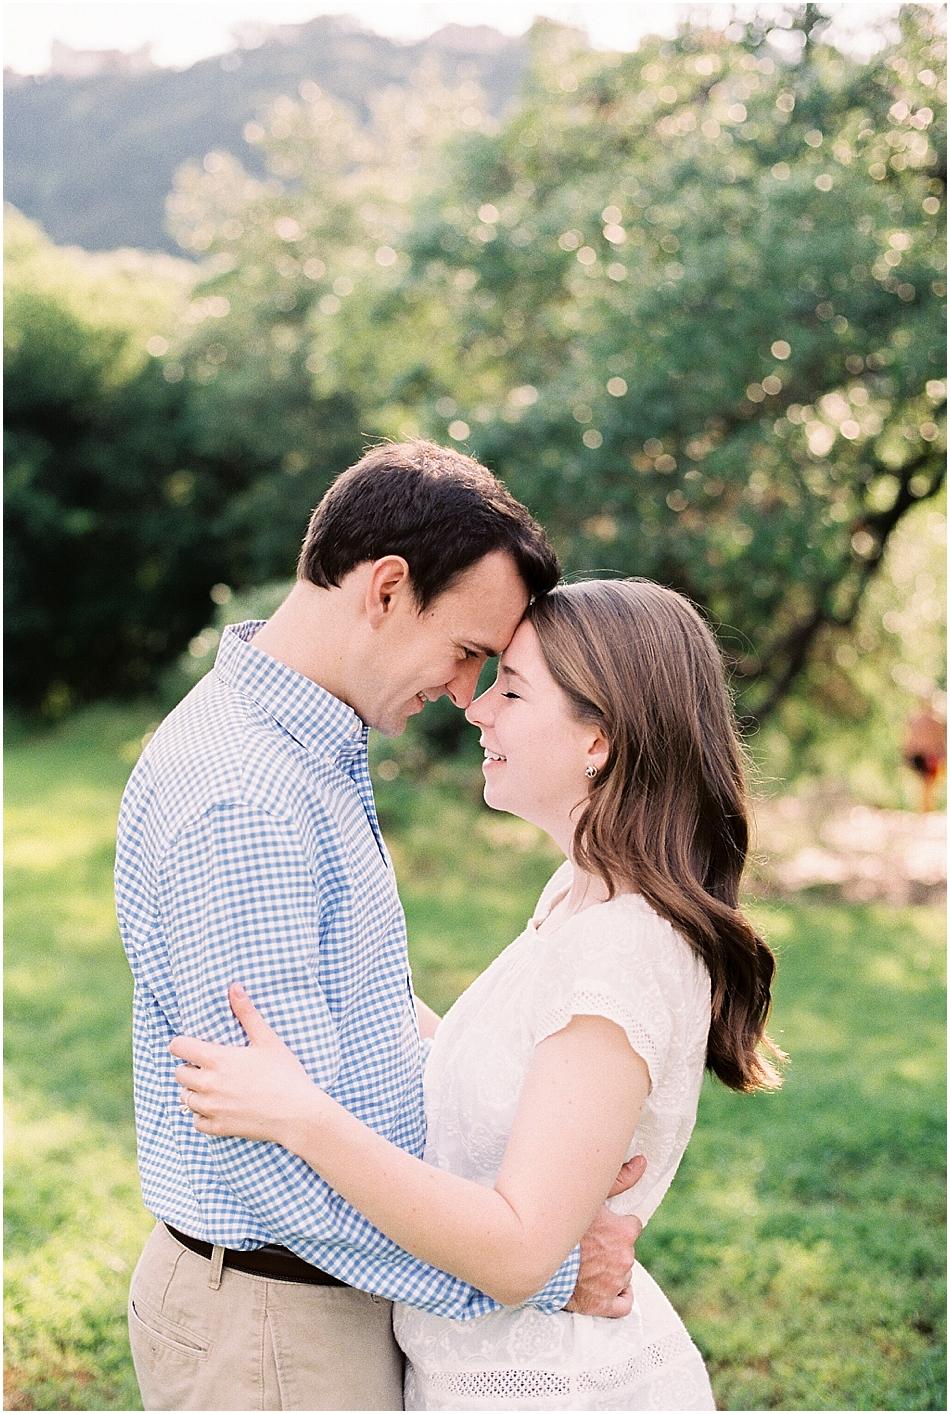 Laura + Nick | Engagement | Fine Art Film | Austin Texas | Emilie Anne Photography-15.jpg